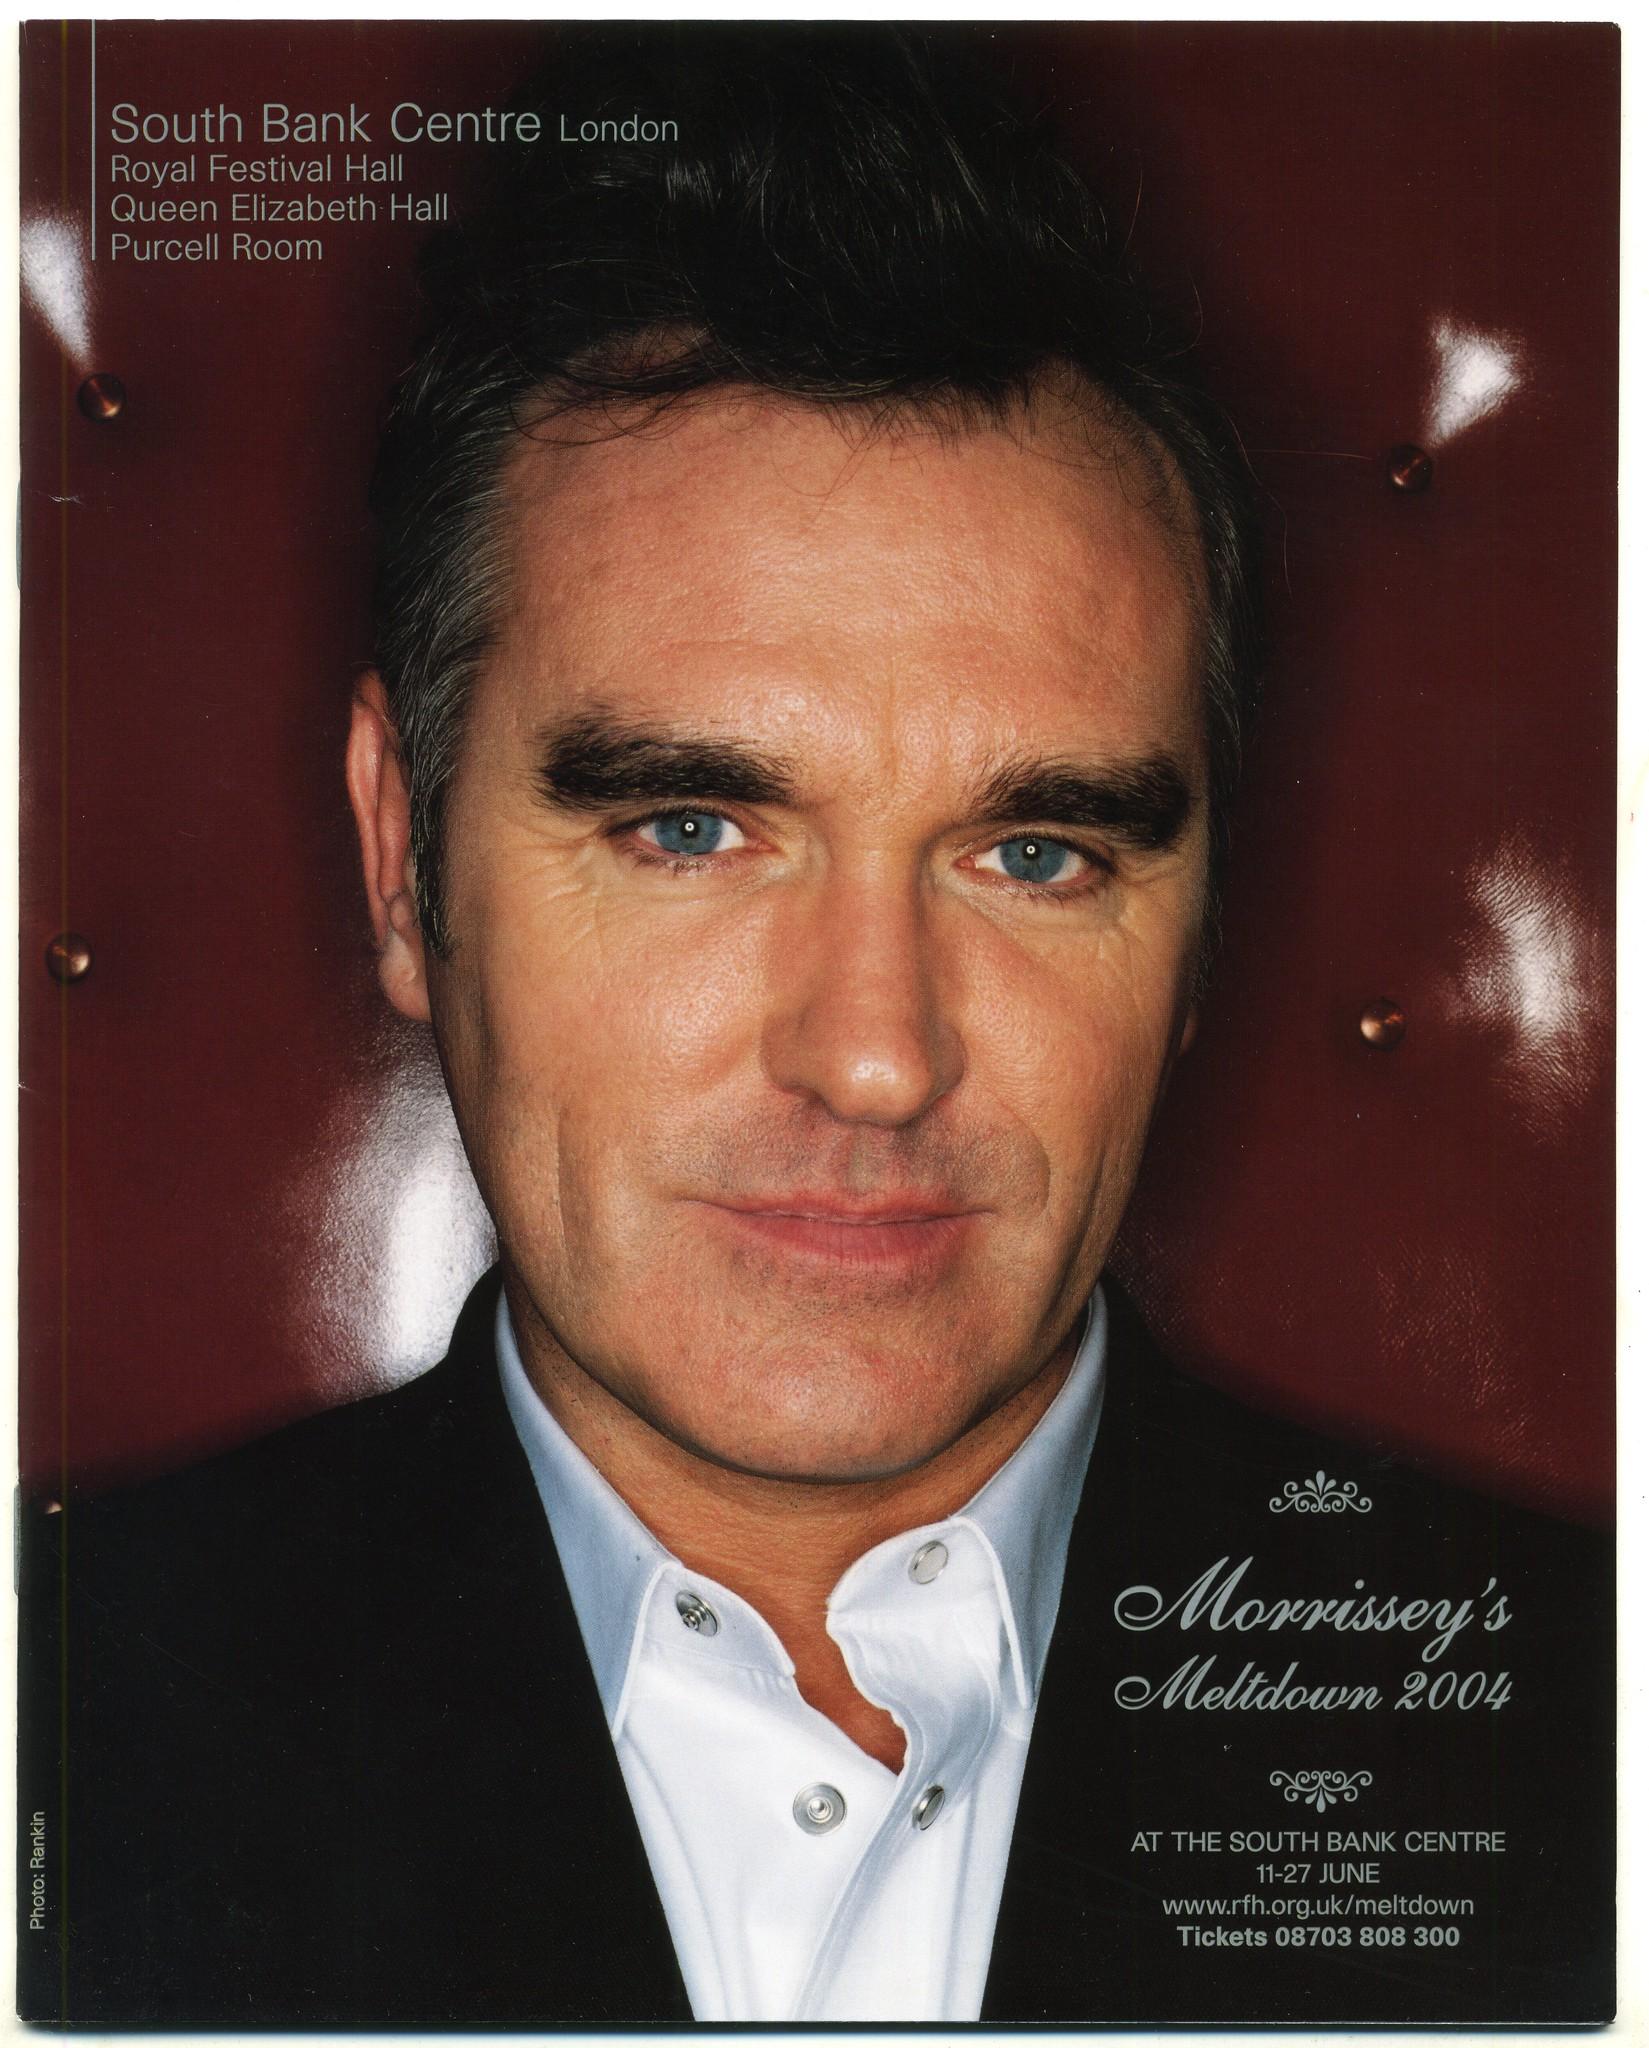 Morrissey Rankin 2004.jpg